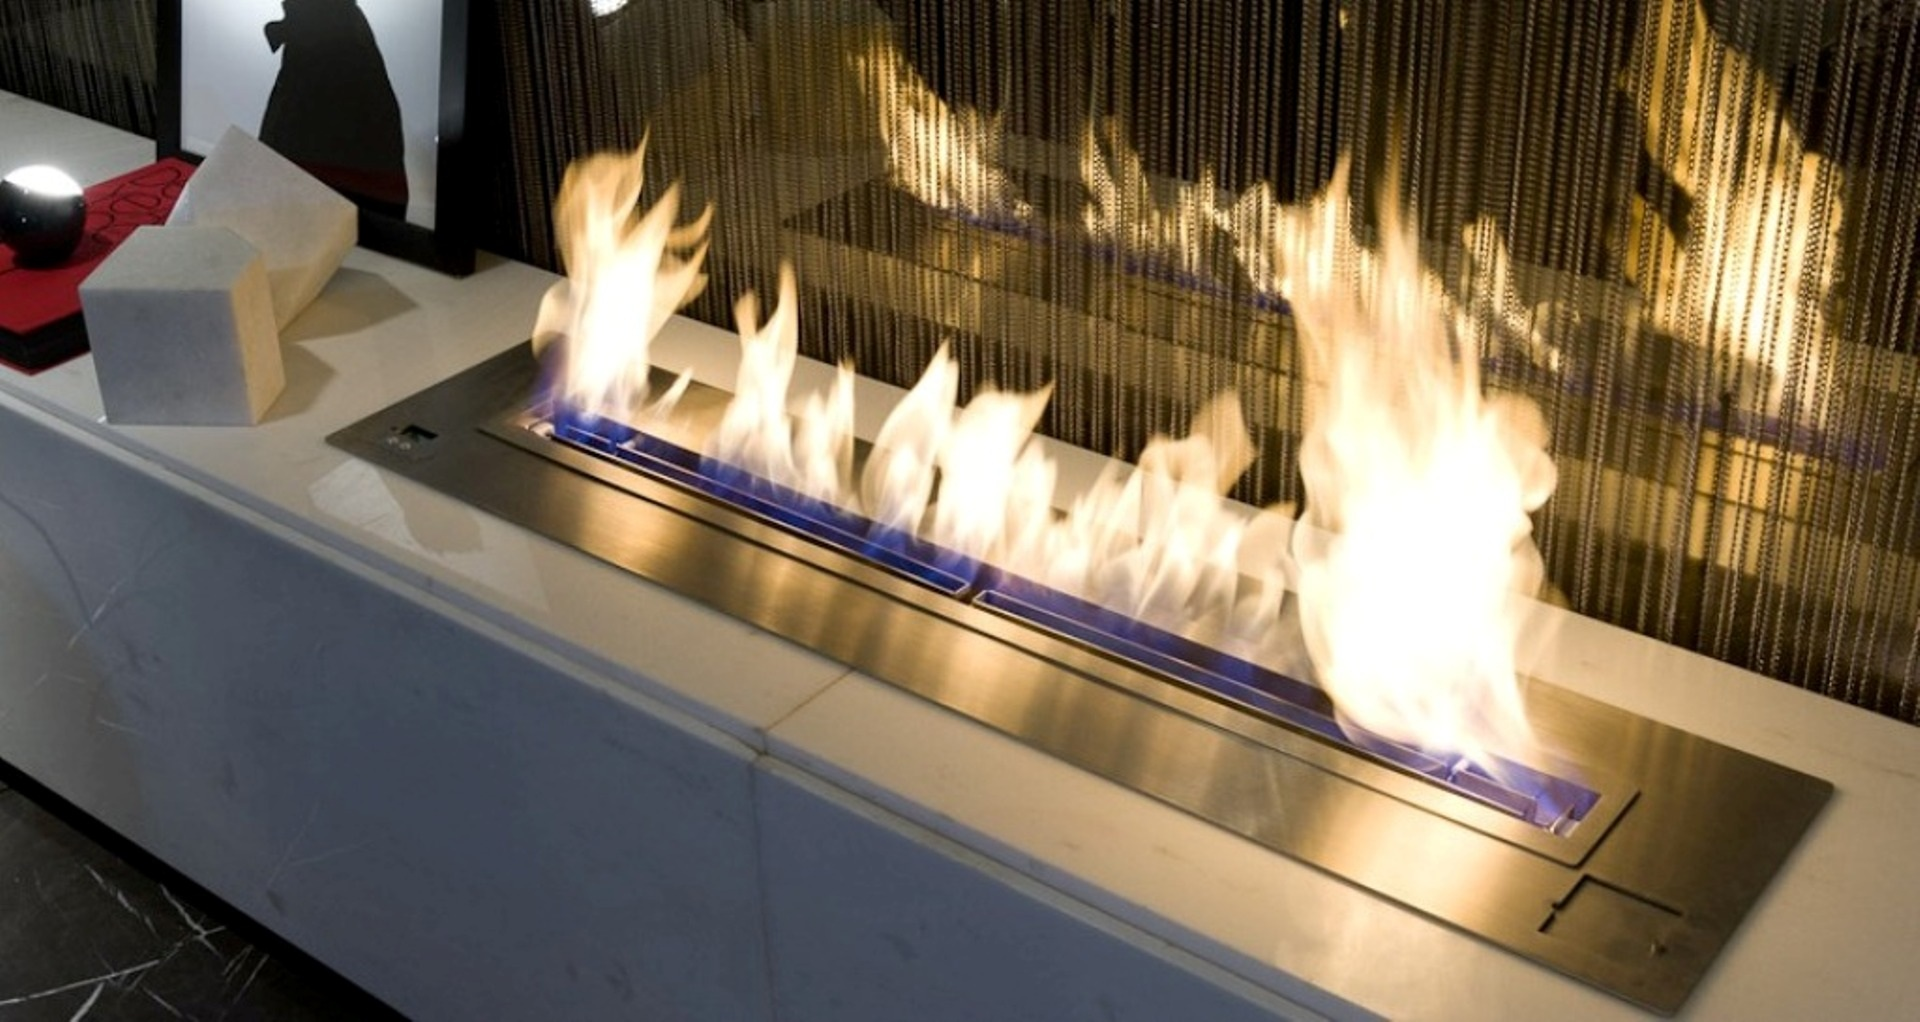 free stock photo of bioethanol burner burner ecofriendly